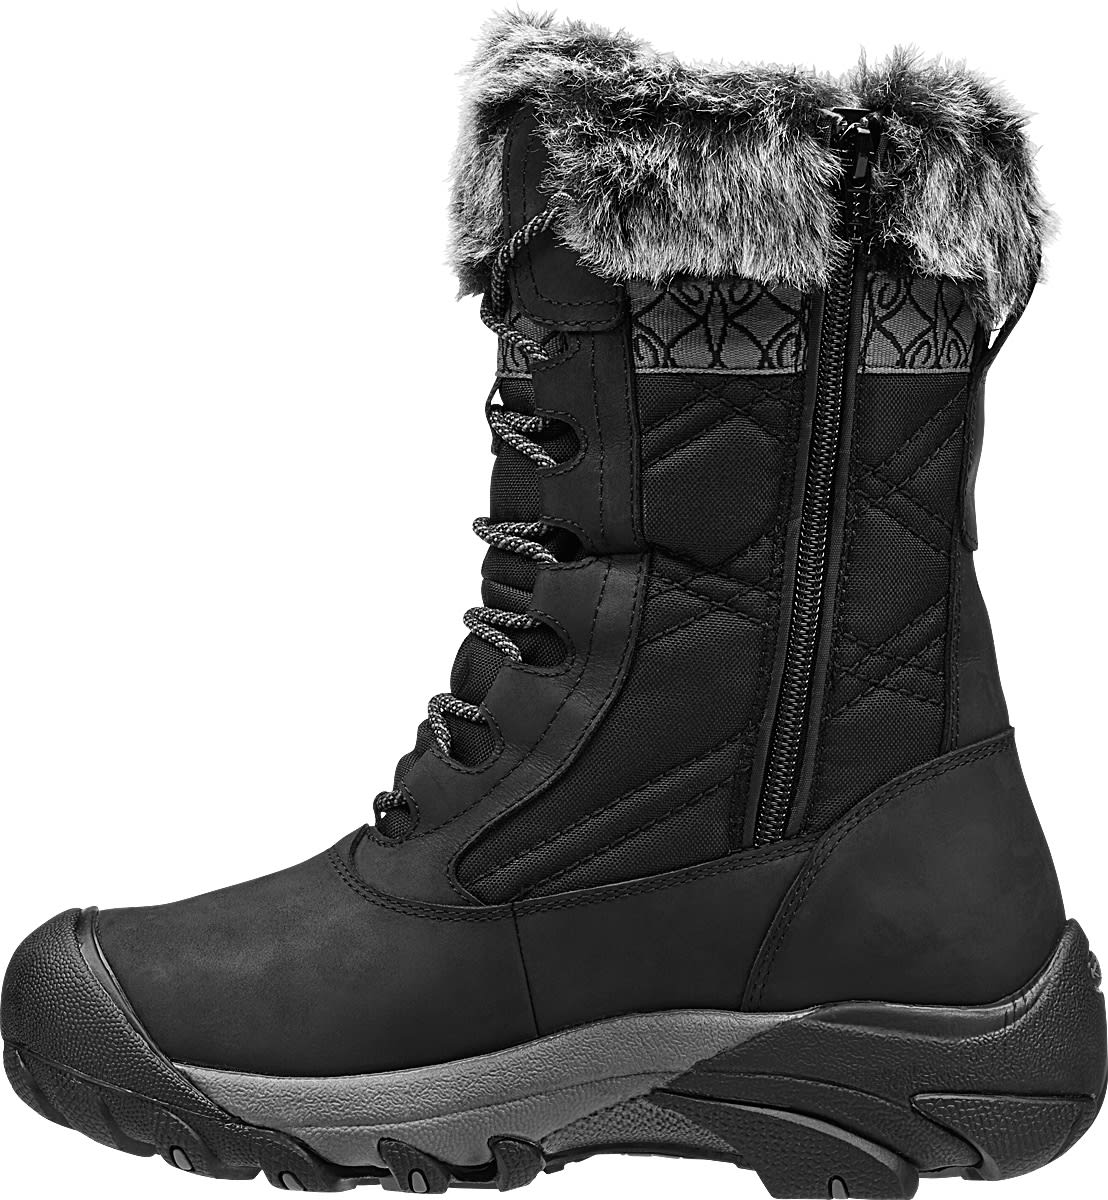 On Sale Keen Hoodoo Iii Boots Womens Up To 50 Off